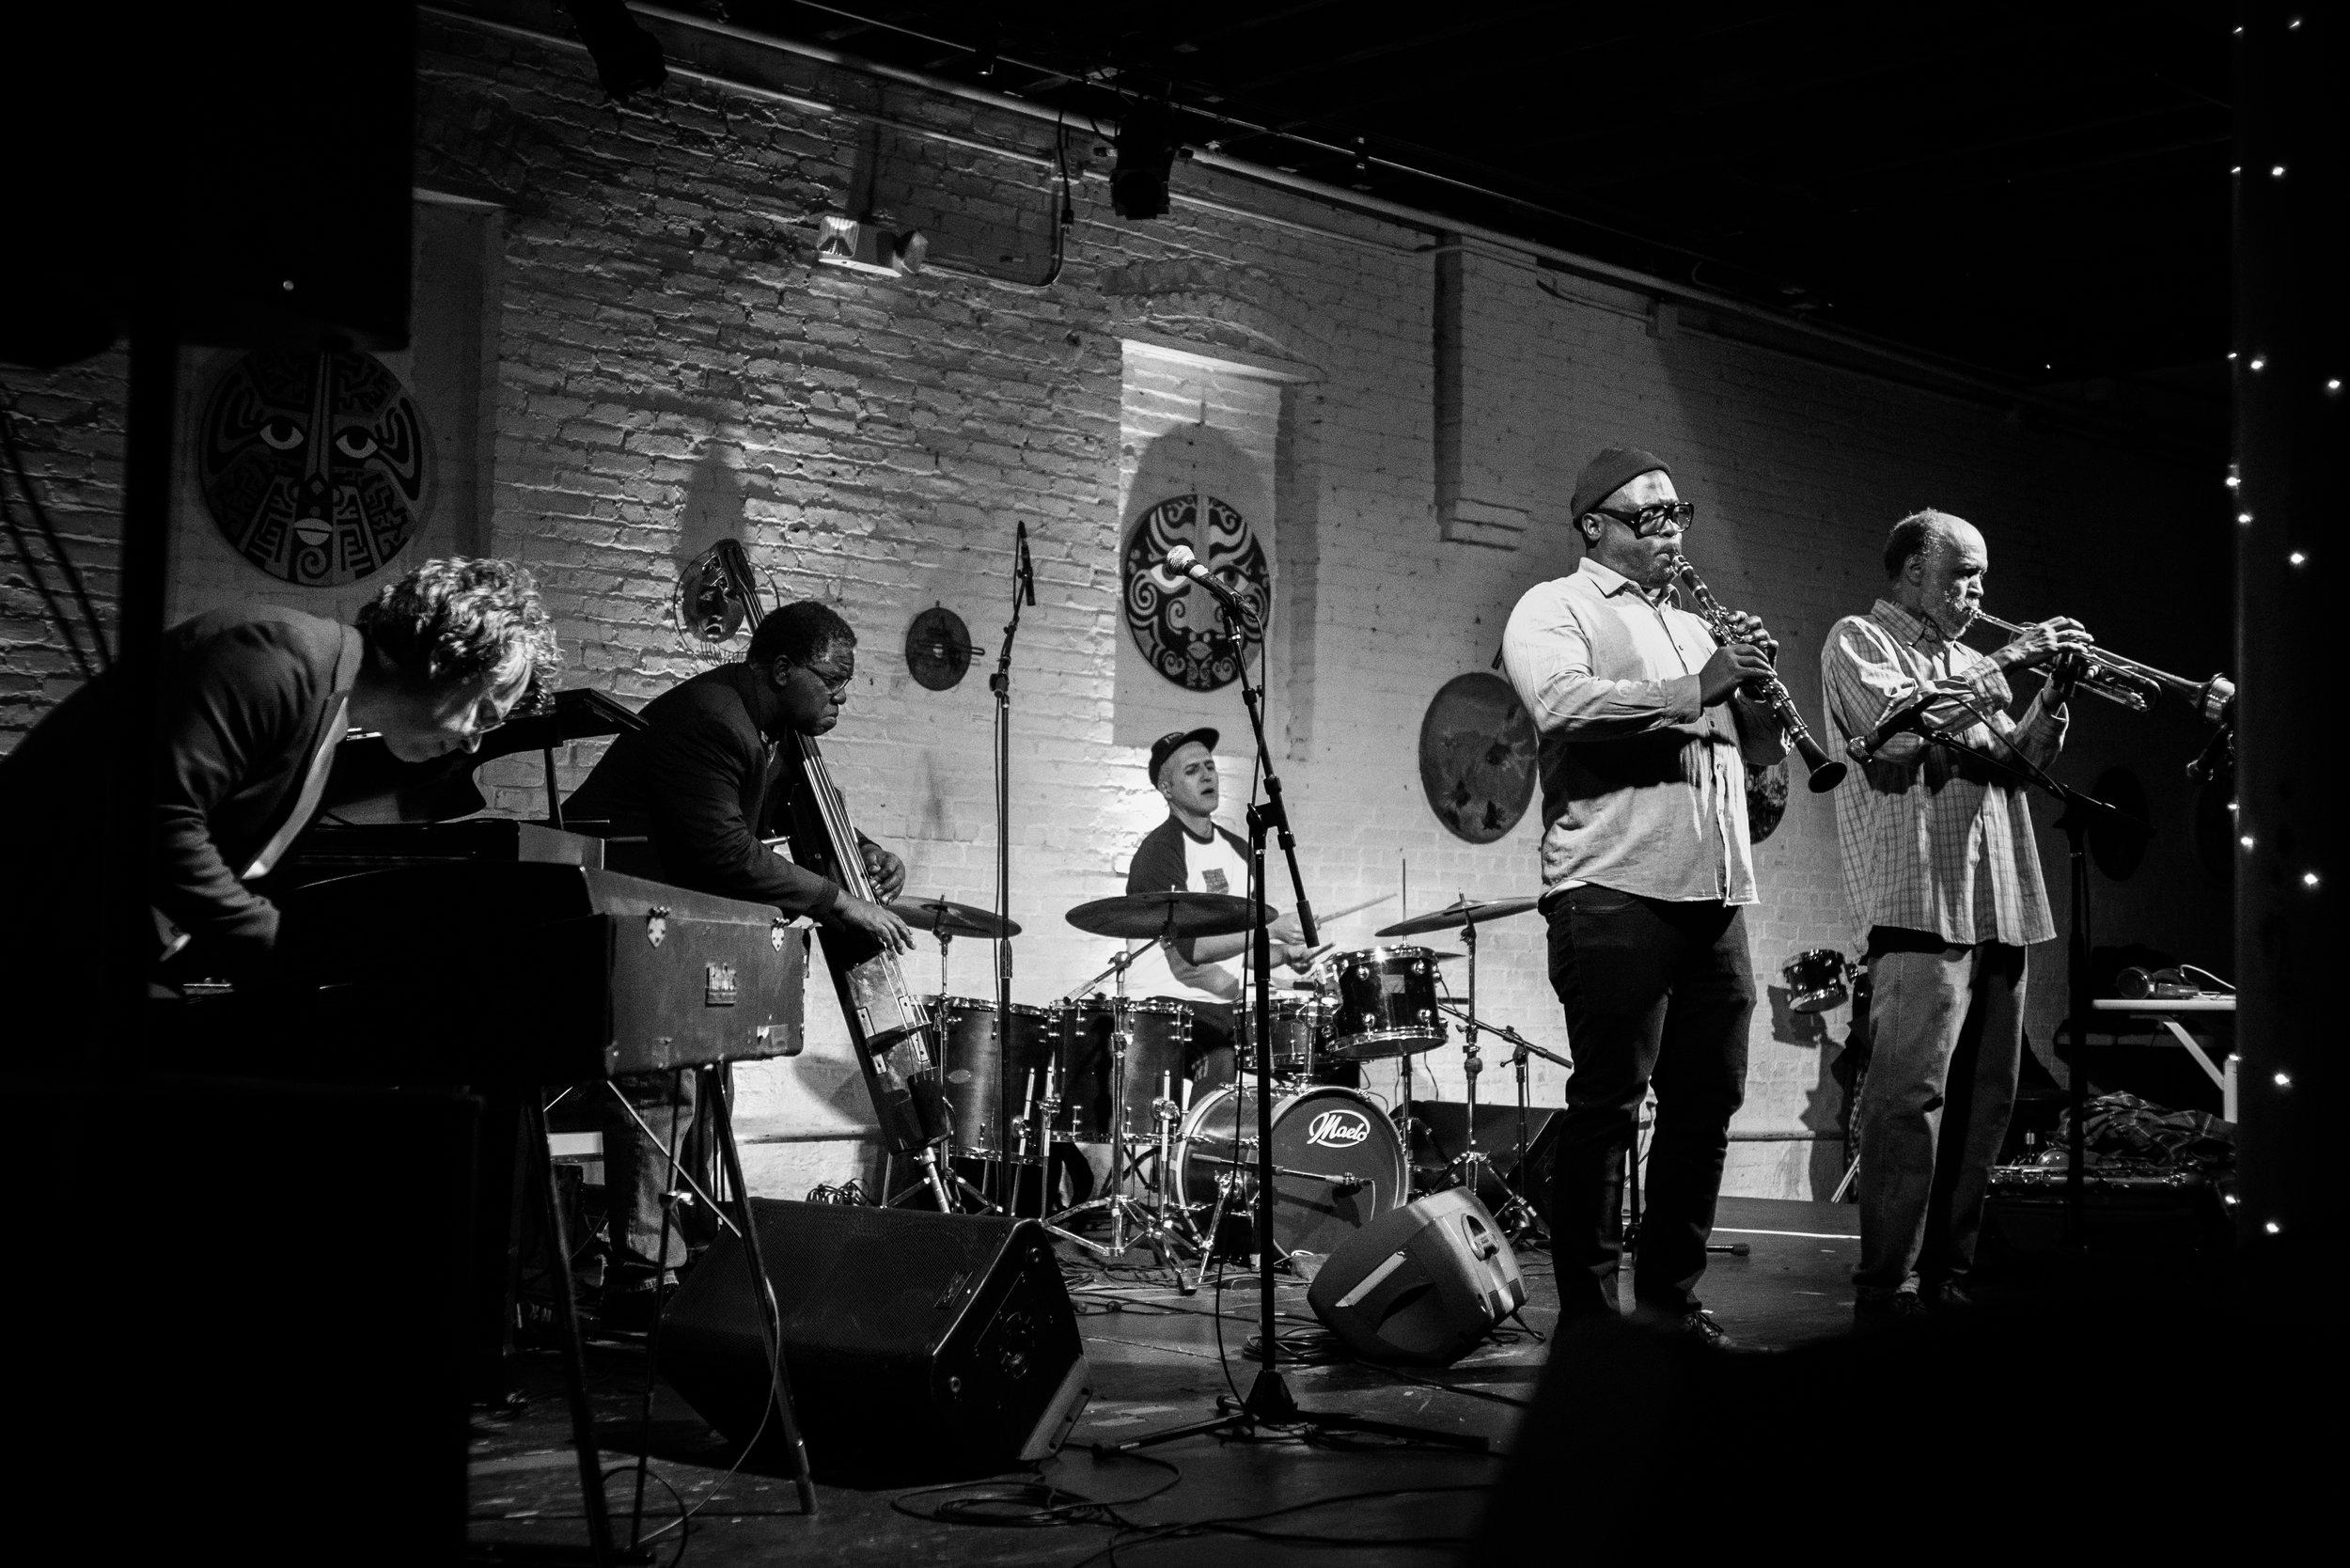 Telepathic Band - Daniel Carter, Patrick Holmes, Matthew Putman, Hilliard Greene, Federico Ughi